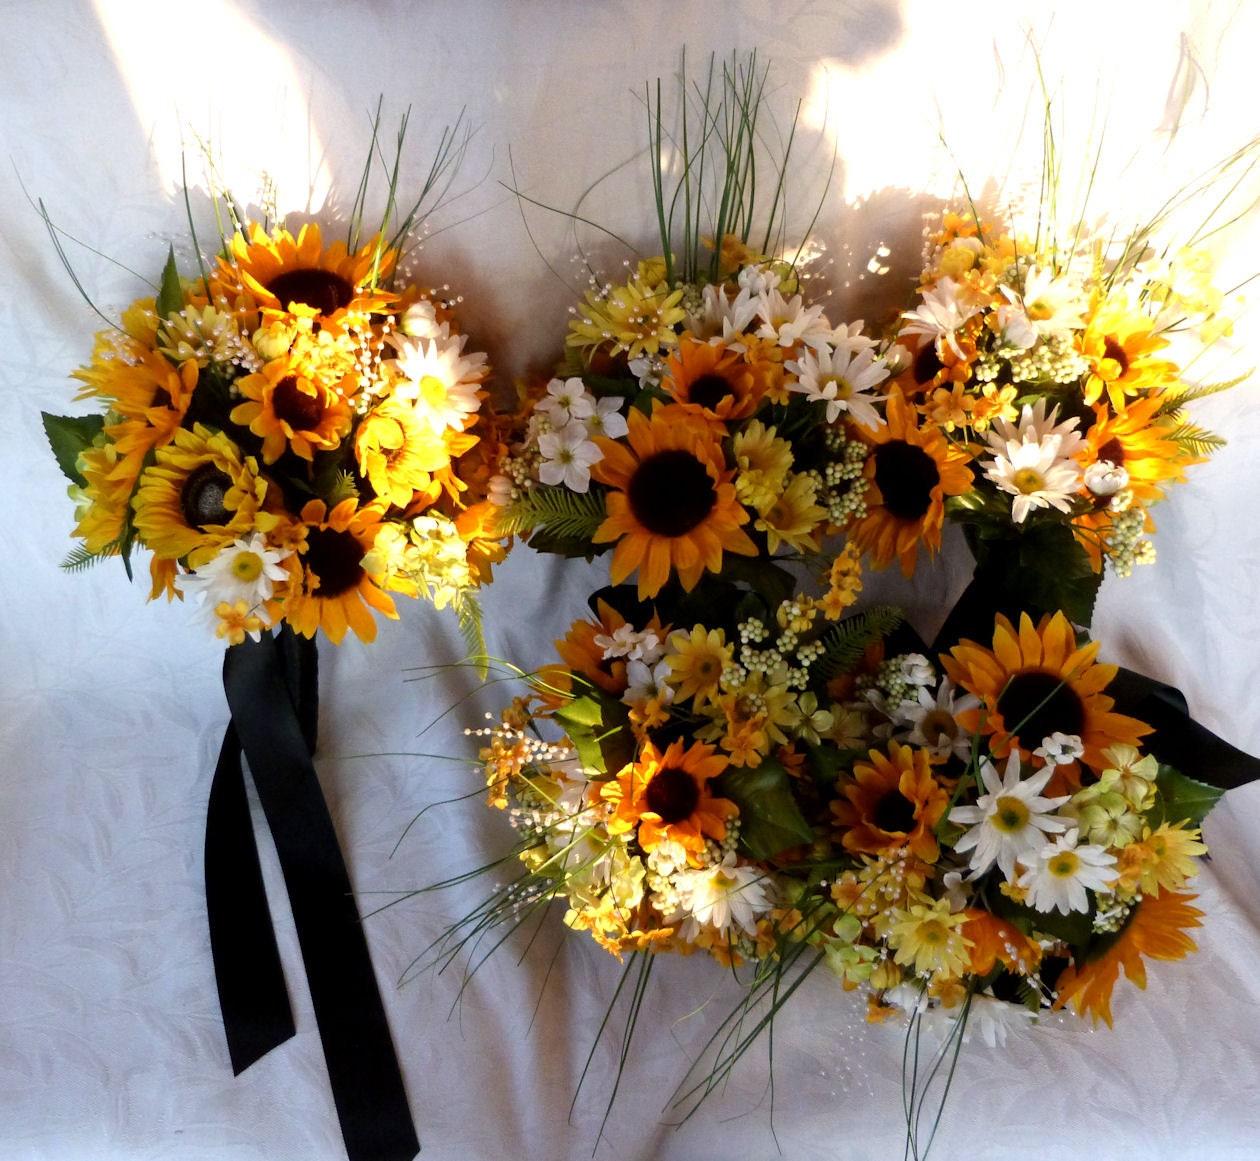 Sunflower Wedding Bouquet Ideas: Reserved Sunflower And Daisy Bridal Bouquets Wedding Bouquets